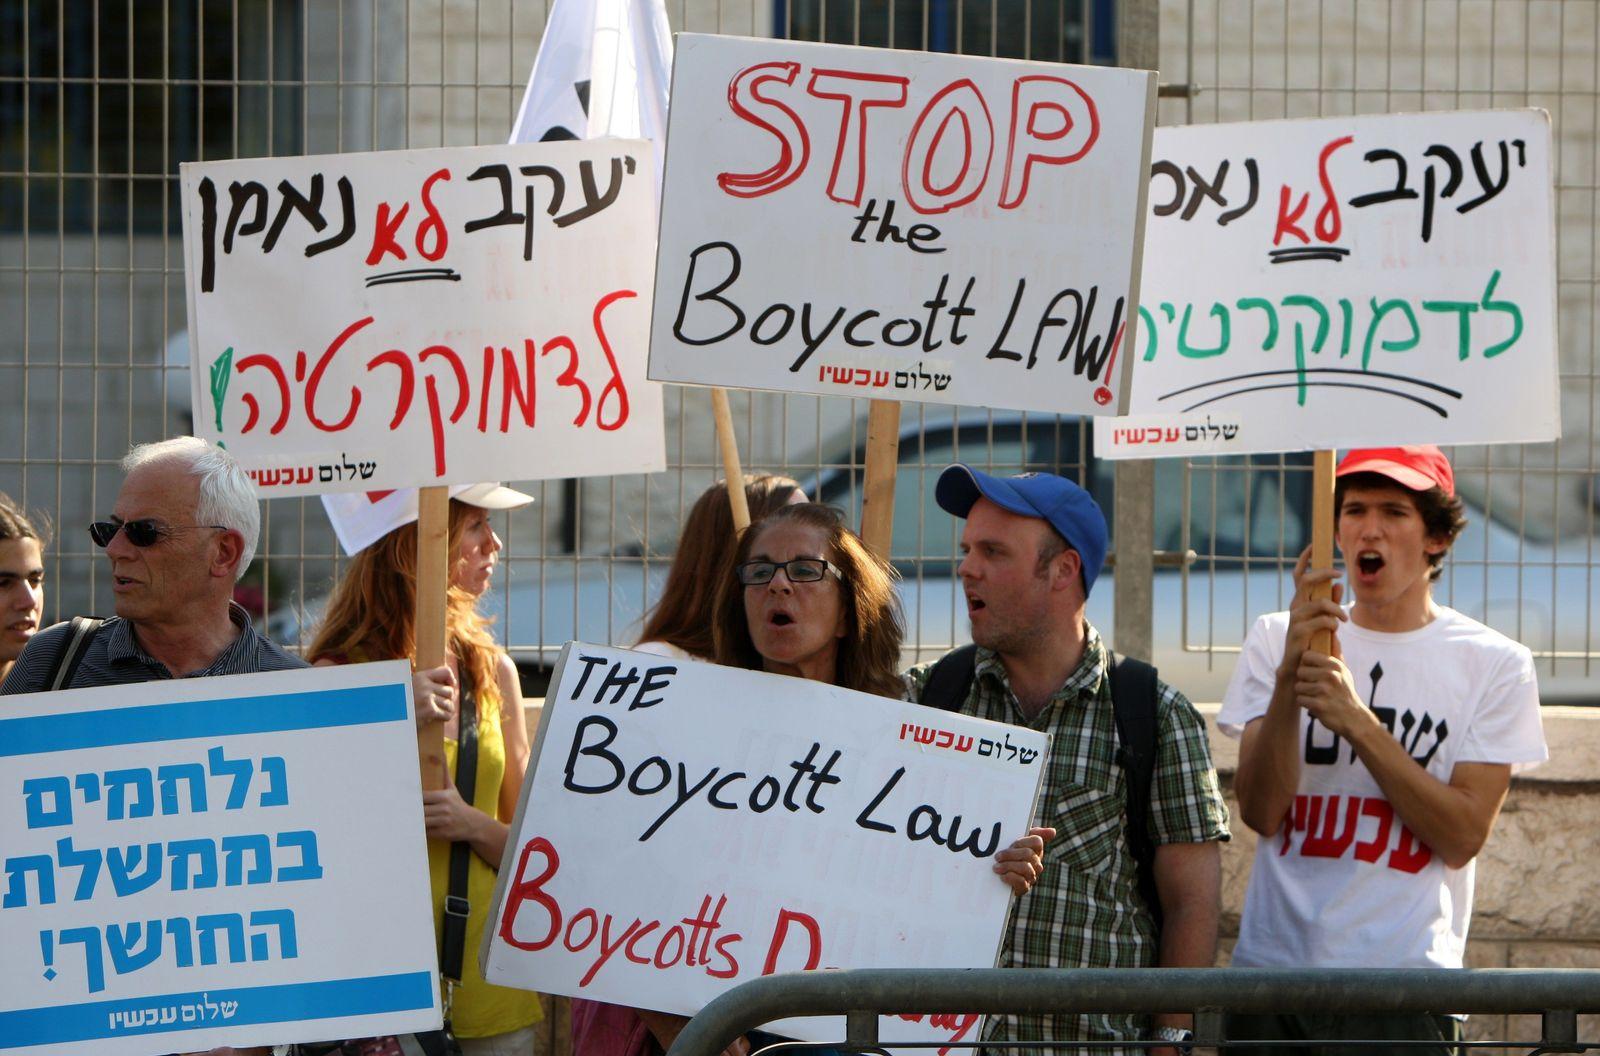 Israel boykott